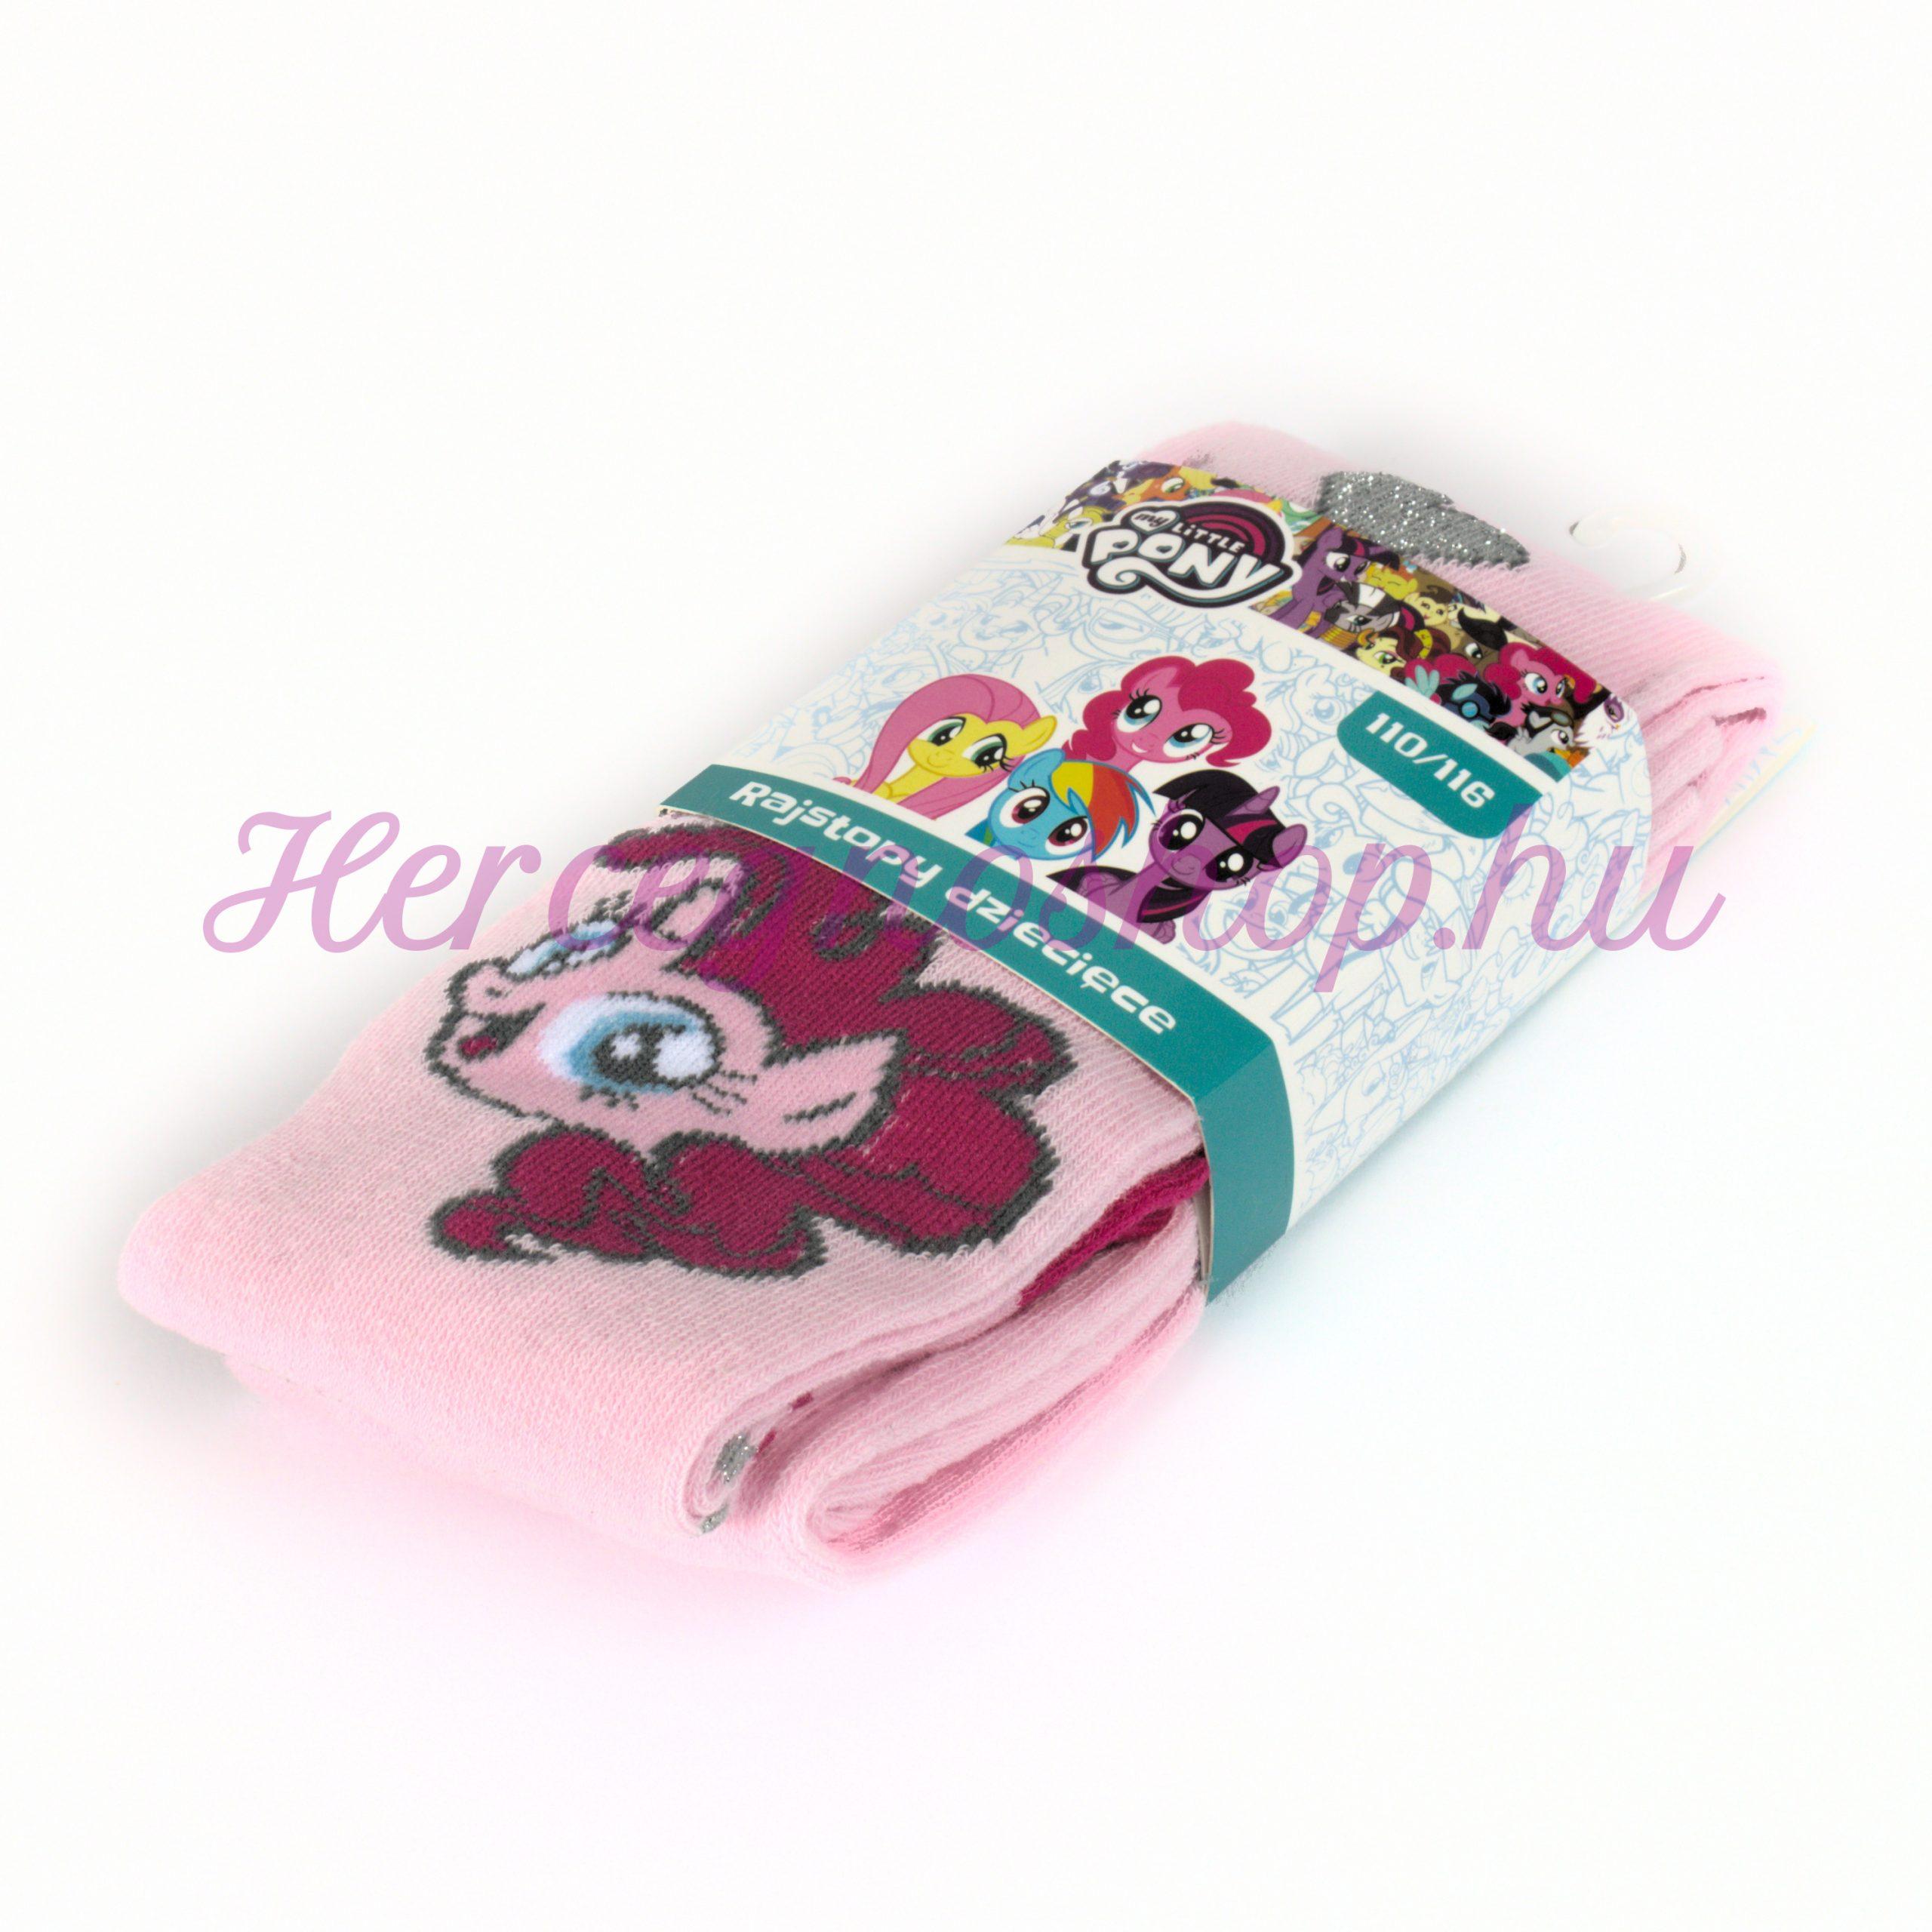 Én kicsi pónim harisny – Pinkie Pie (My little pony)